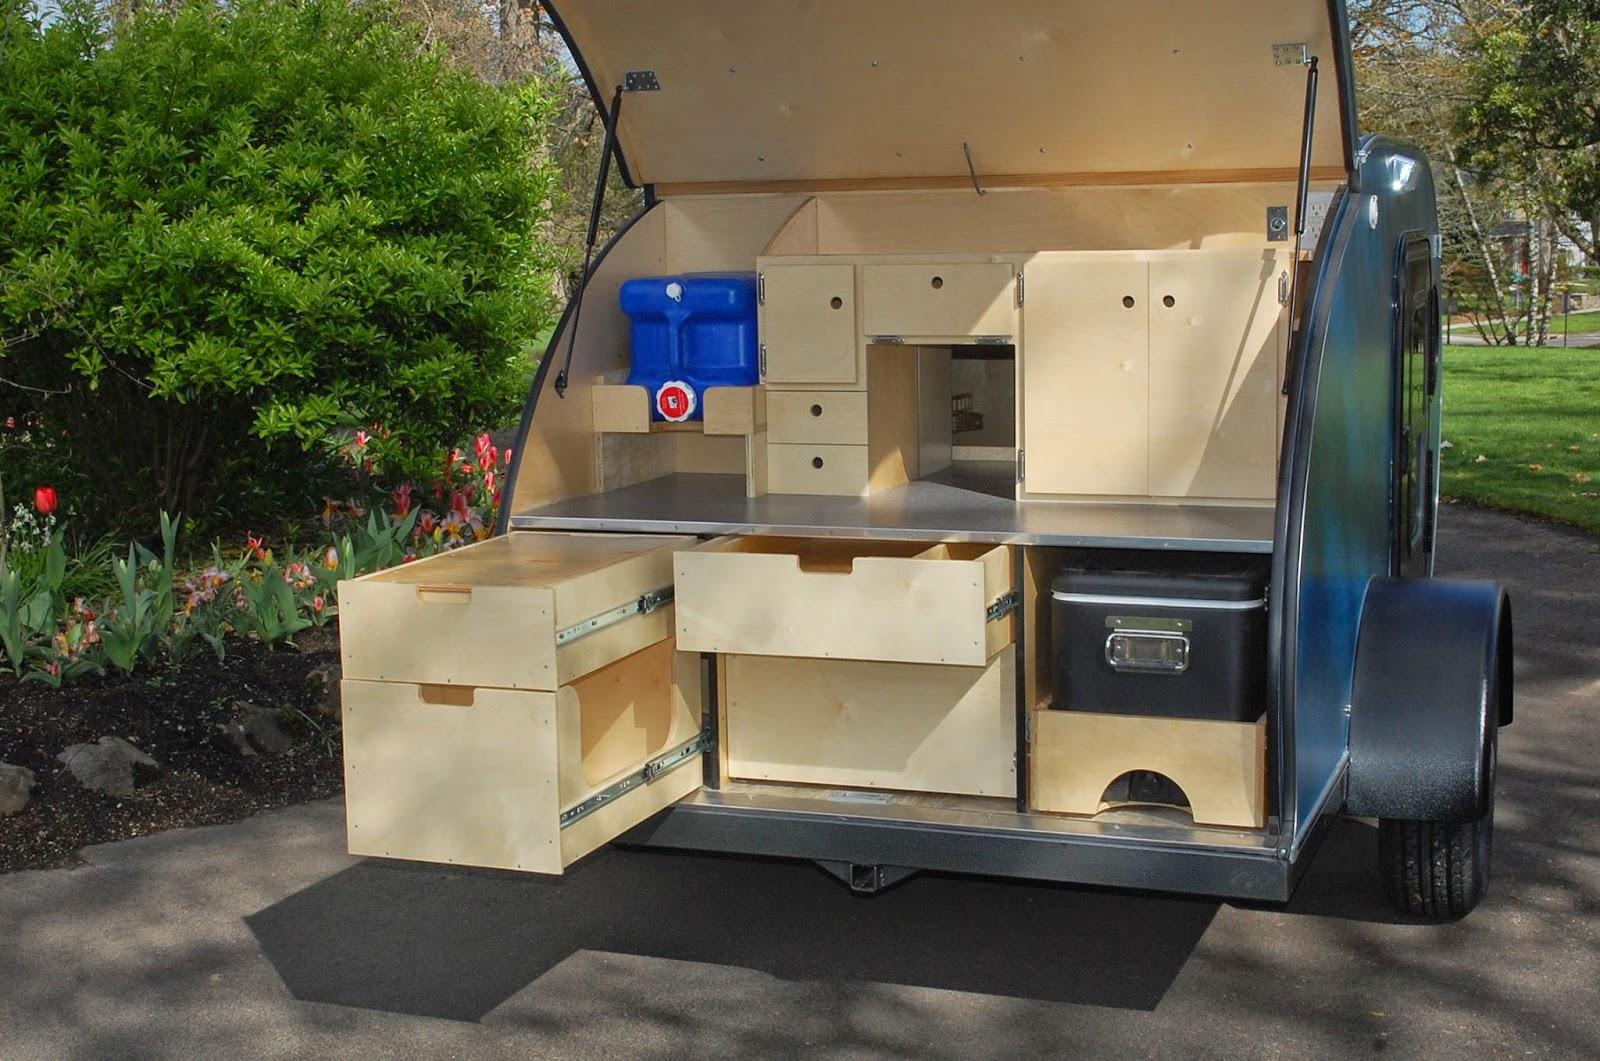 Tiny yellow teardrop march 2015 for Teardrop camper kitchen ideas